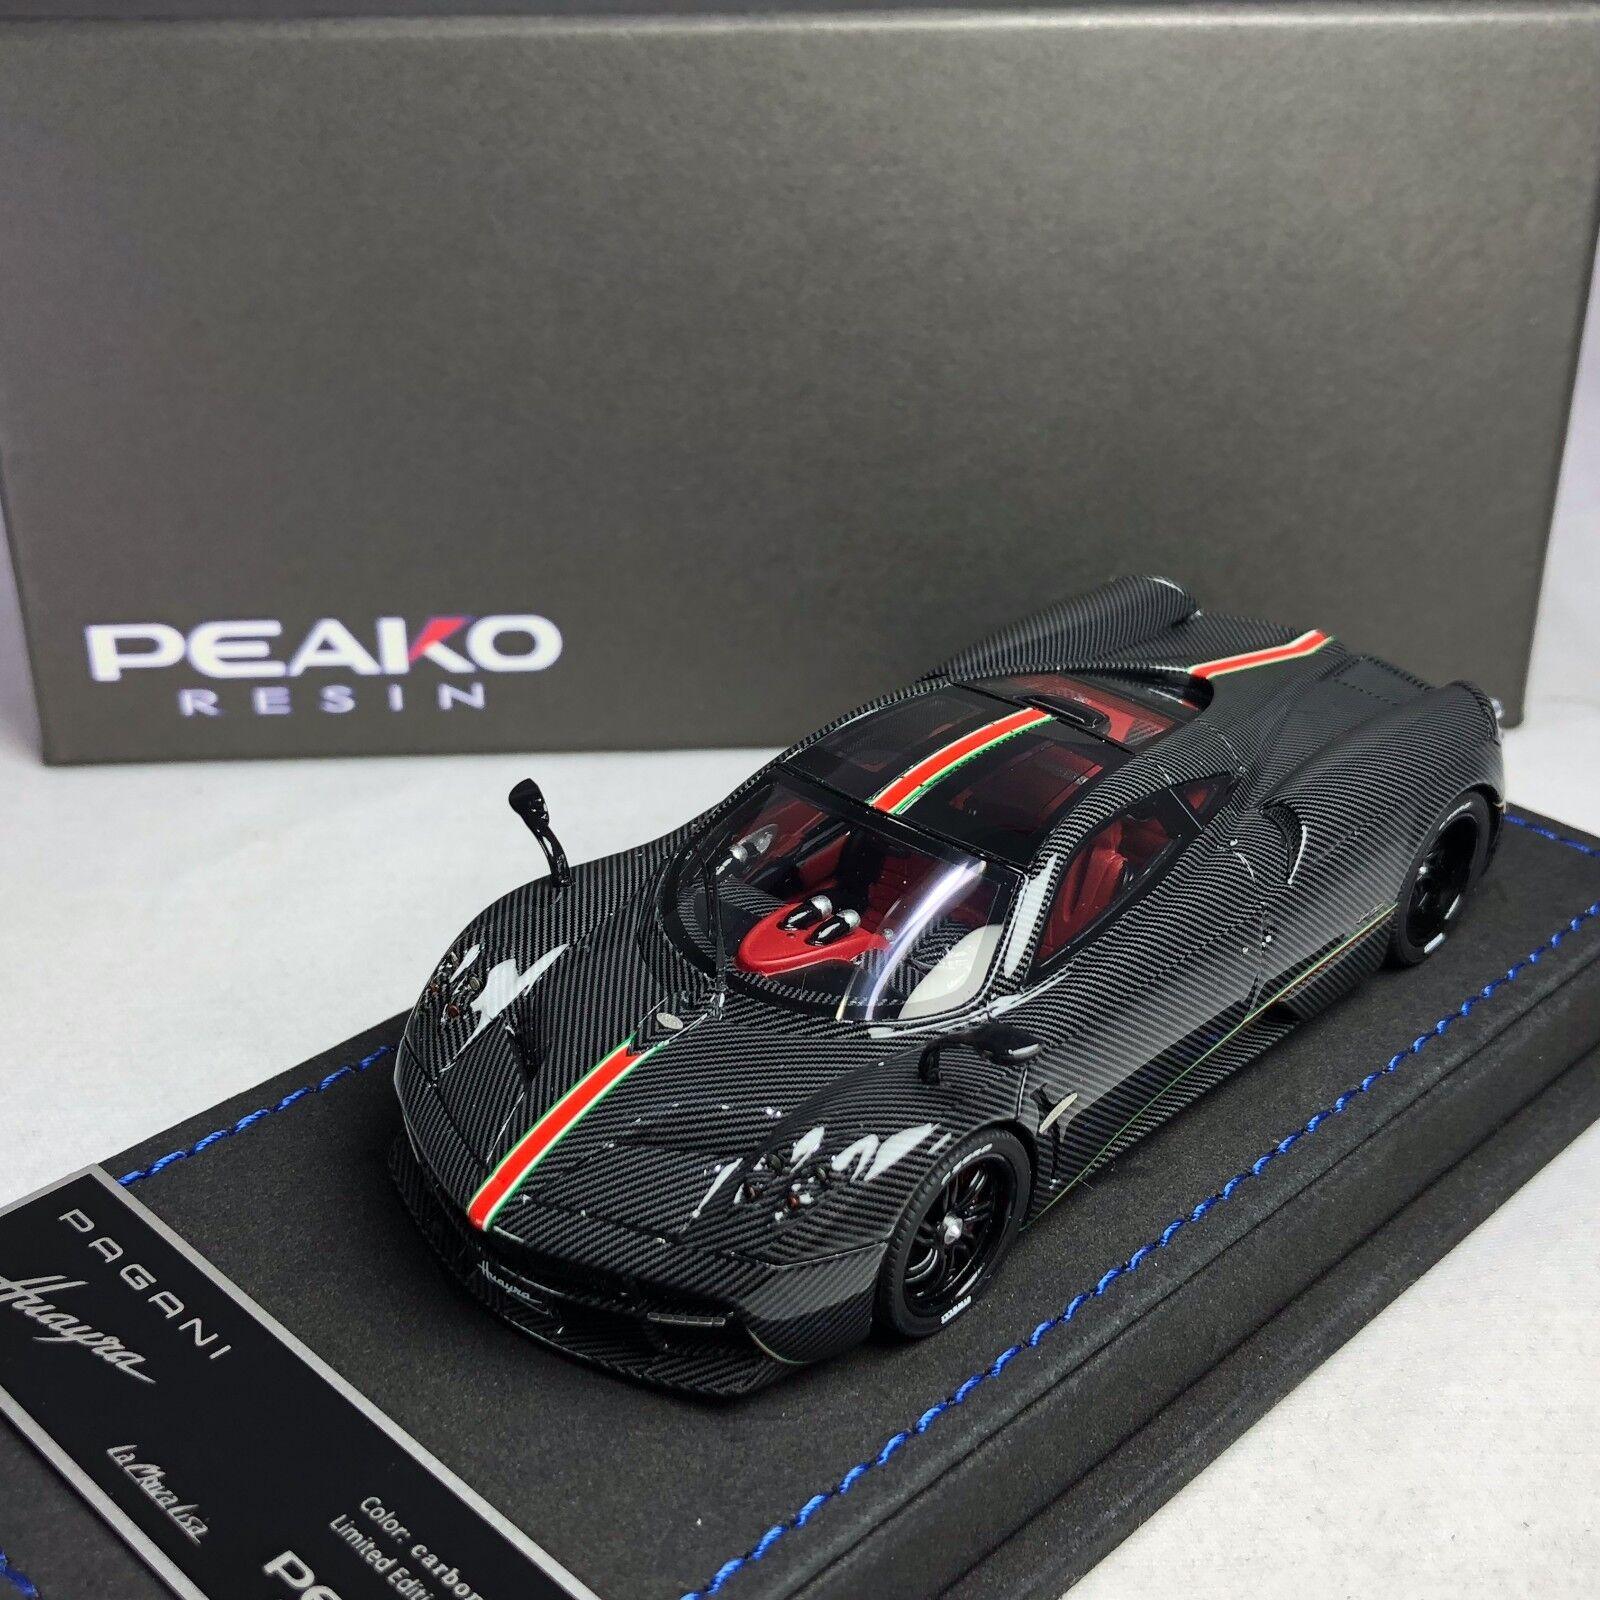 1/43 Peako Pagani Huayra la Monza Lisa todo de carbono Ltd 50 PC 30306